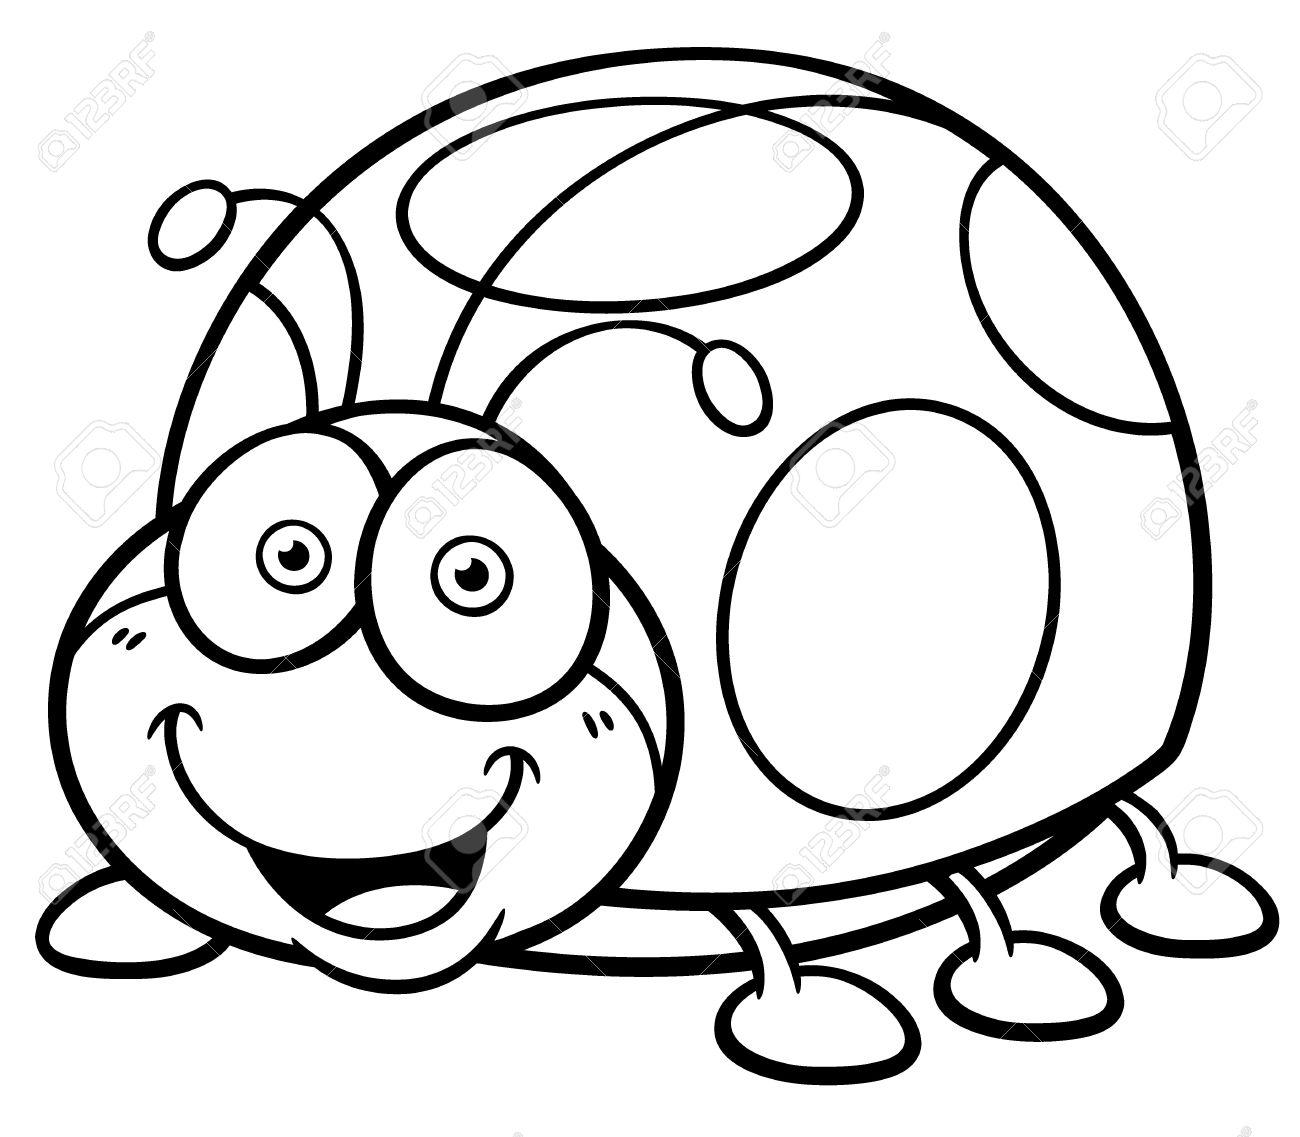 Ladybug Cartoon Drawing at GetDrawings | Free download